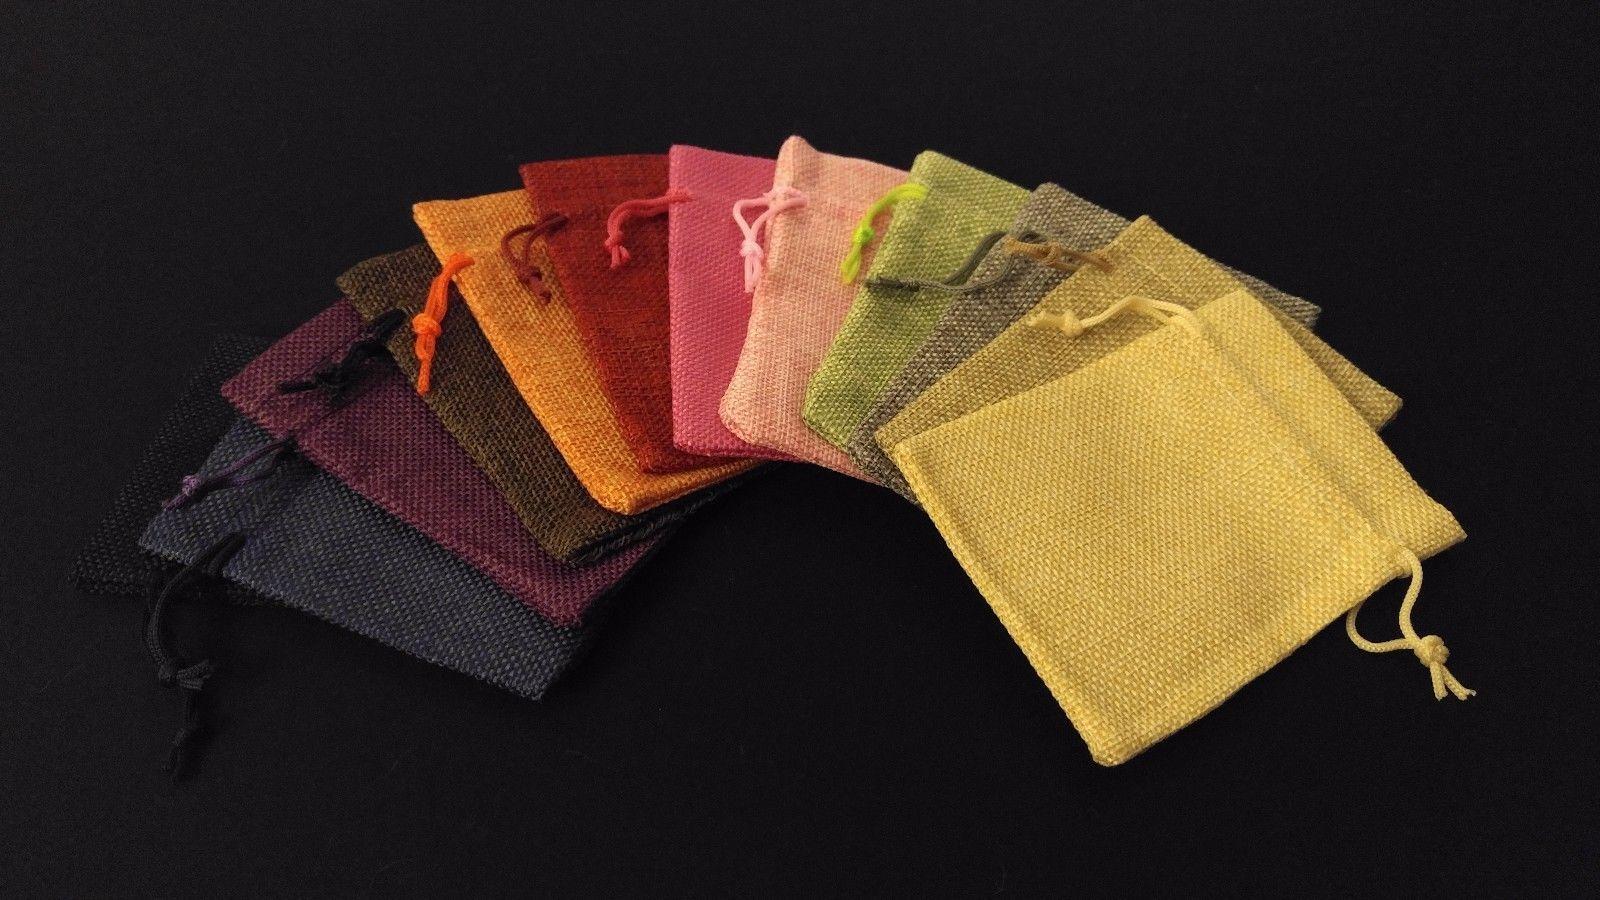 10pc CREAM Burlap Cloth Drawstring Gift Bags Party Wedding Favors 9X12CM